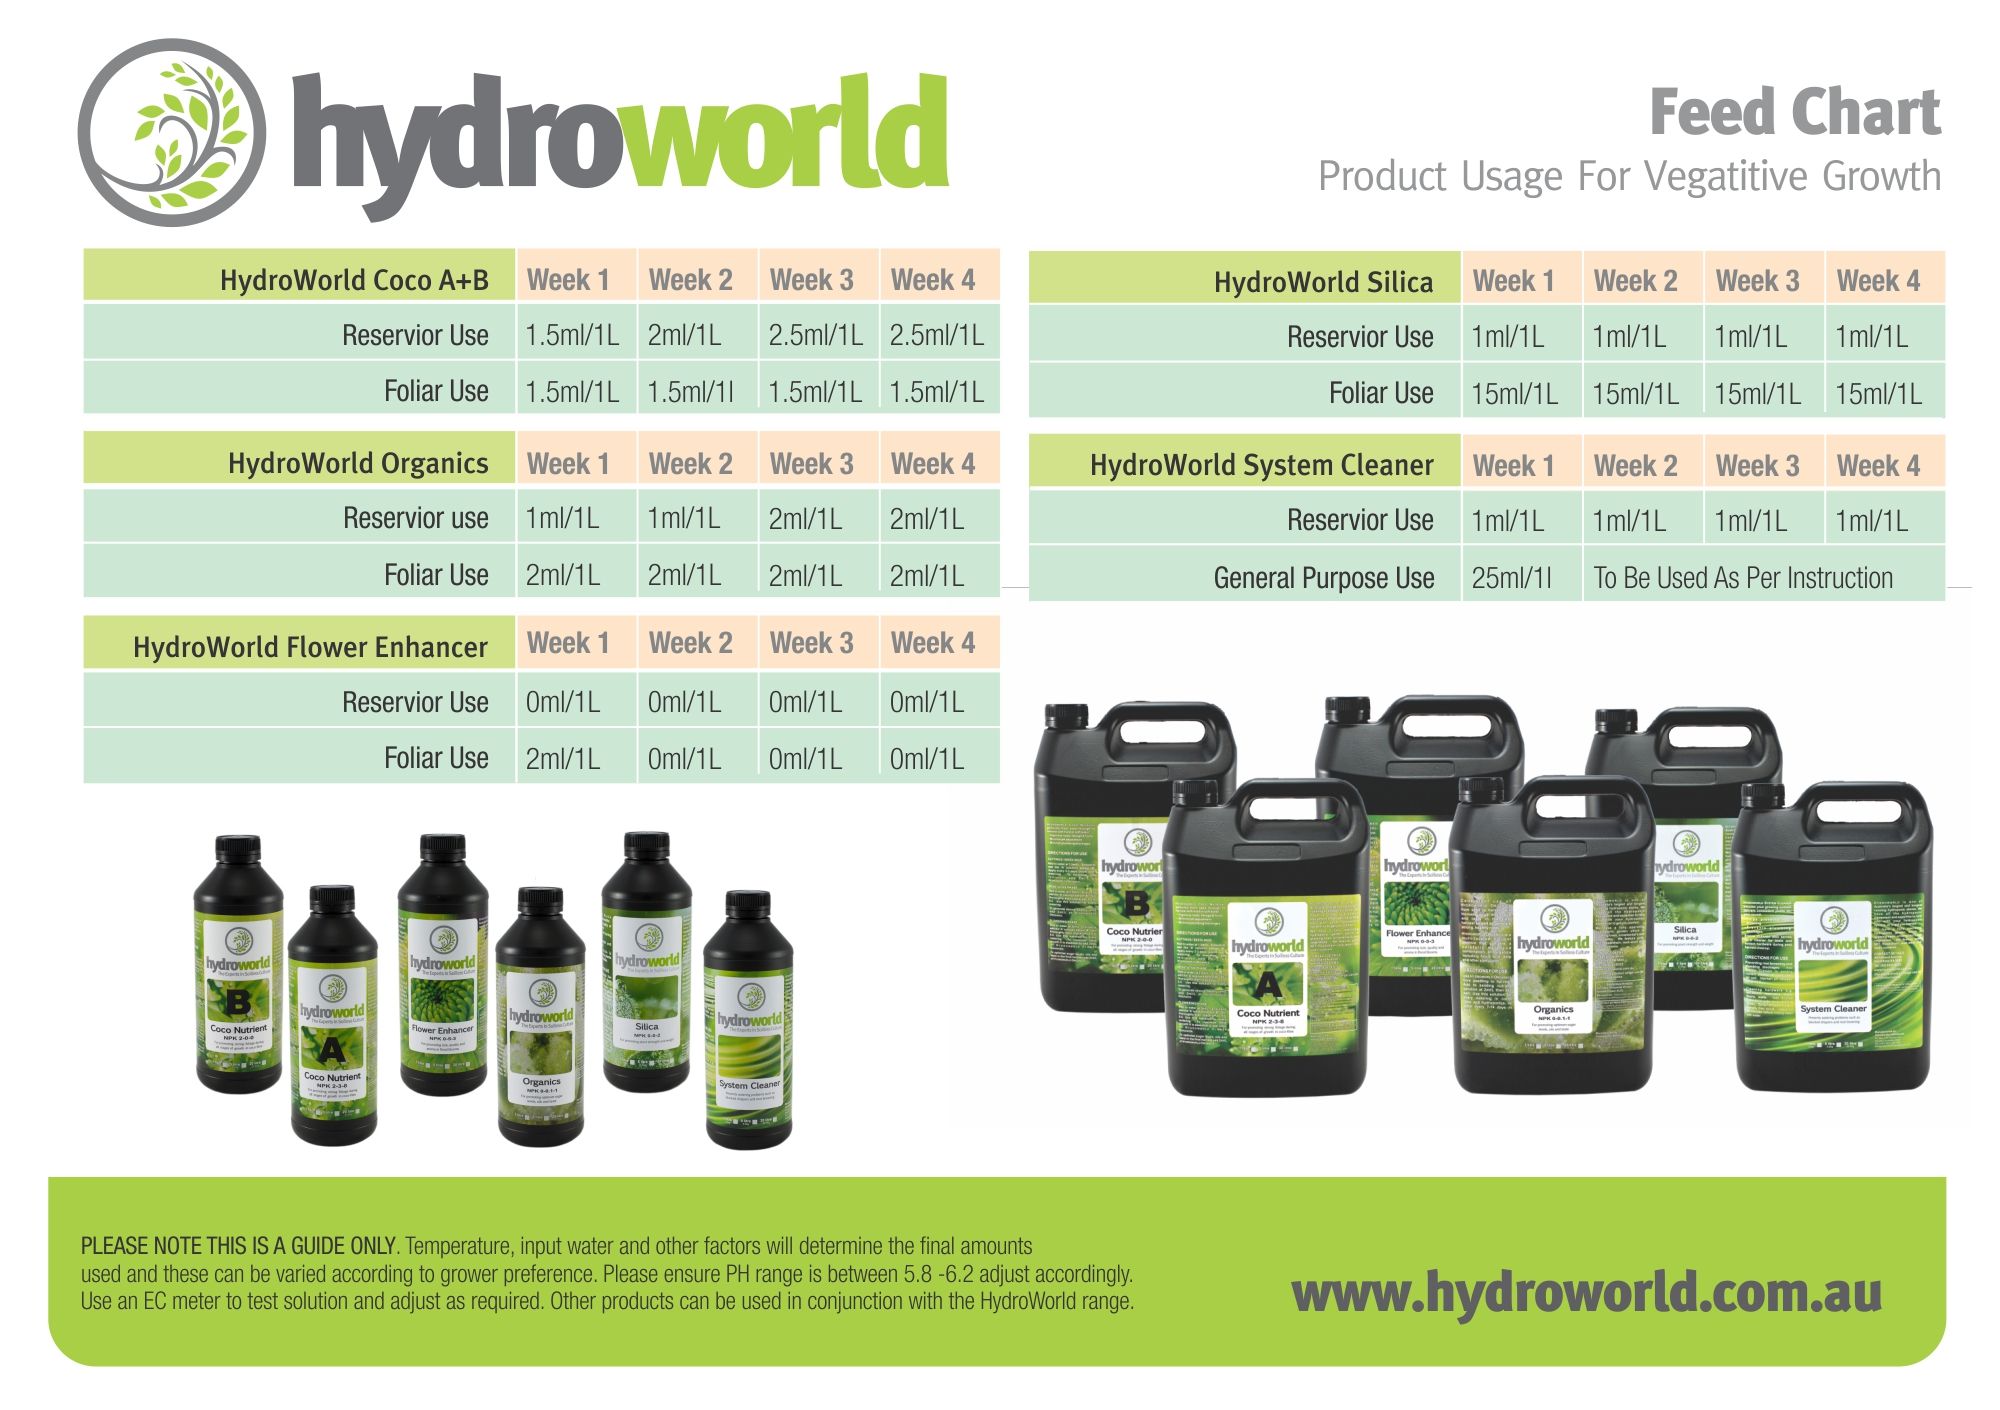 hydroworld-feed-chart-veg.jpg